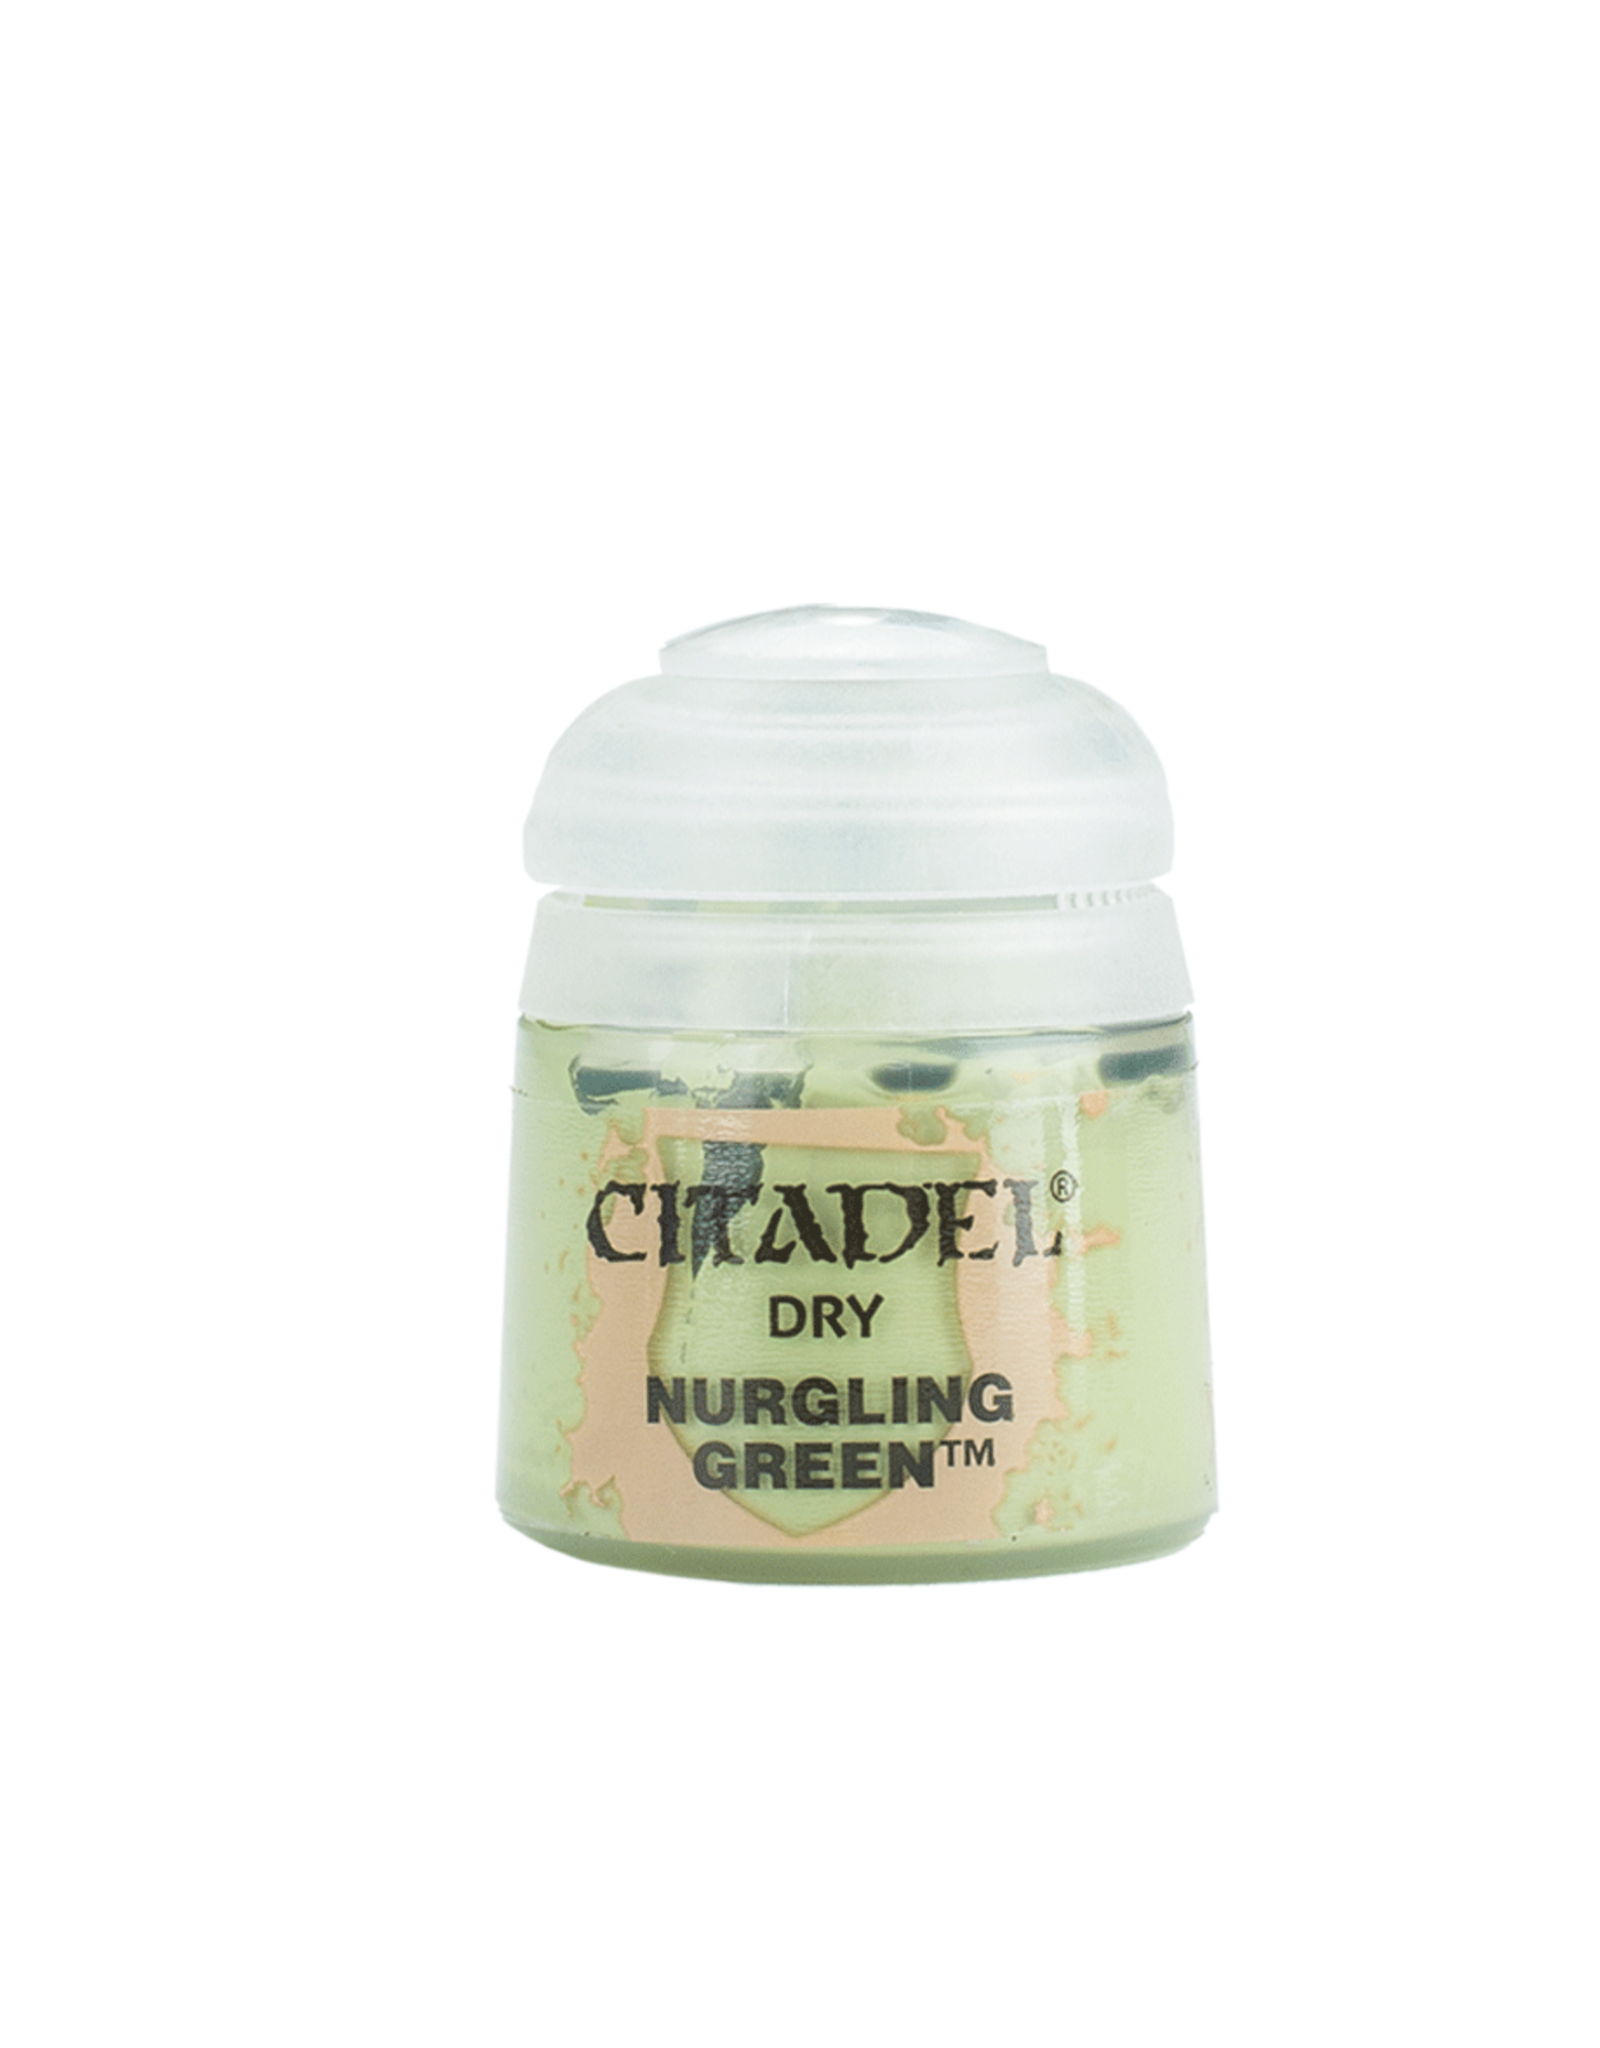 Games-Workshop Citadel paint Nurgling green Dry (12ML)